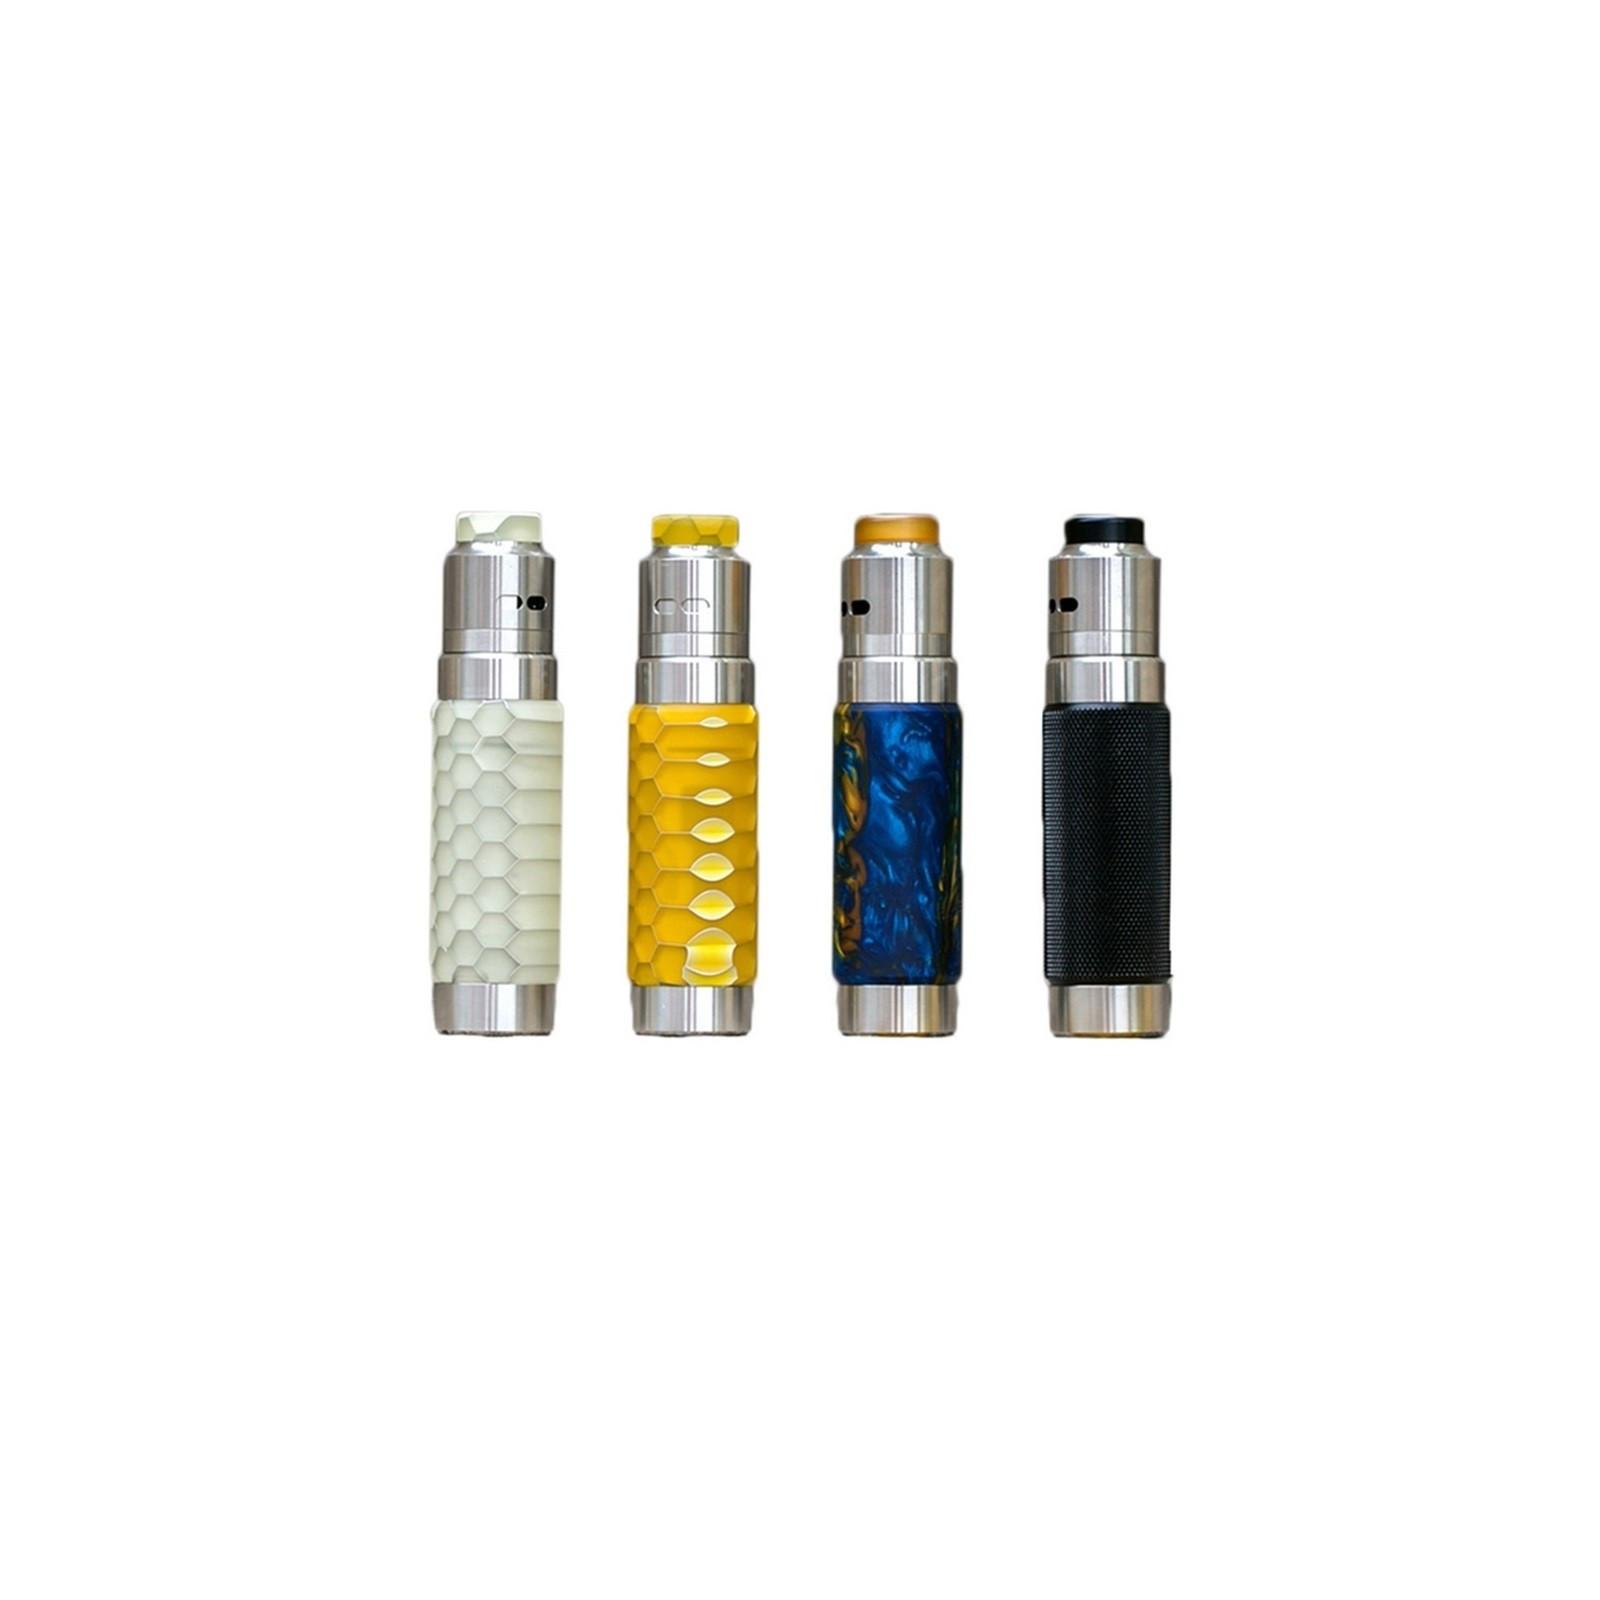 Kit Luxotic BF Tobhino - Wismec